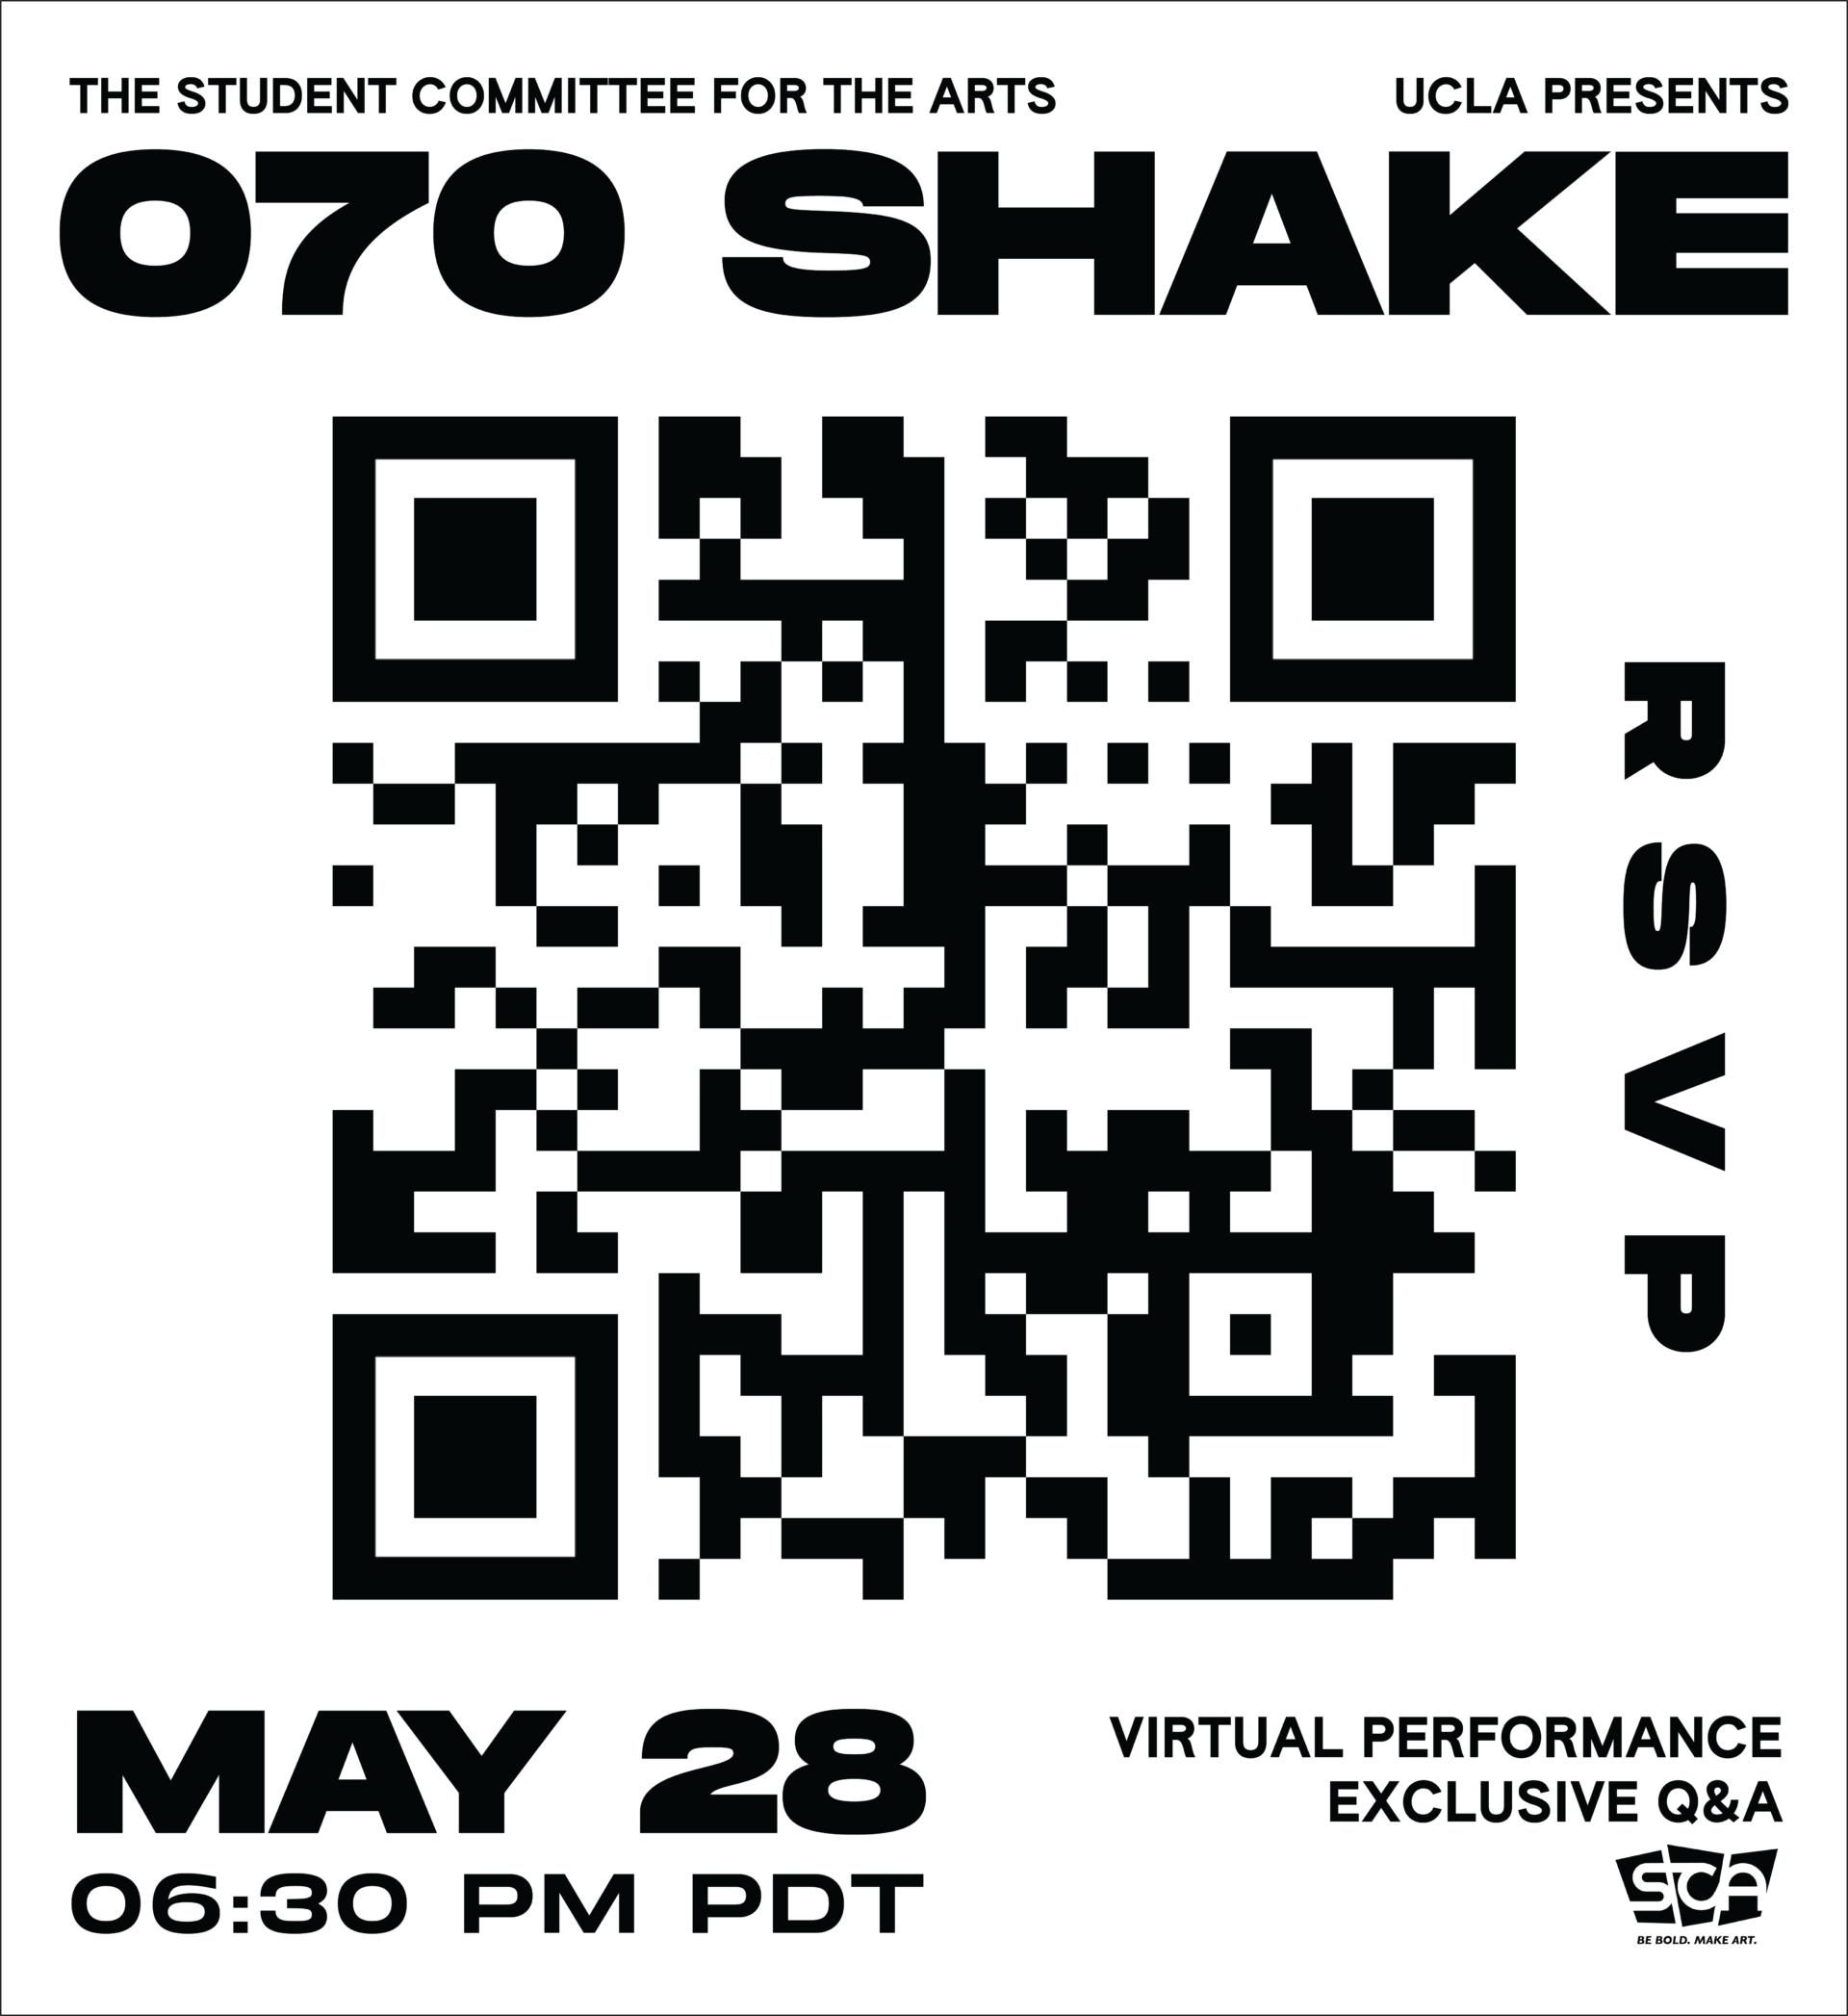 070 Shake Performance QR Code